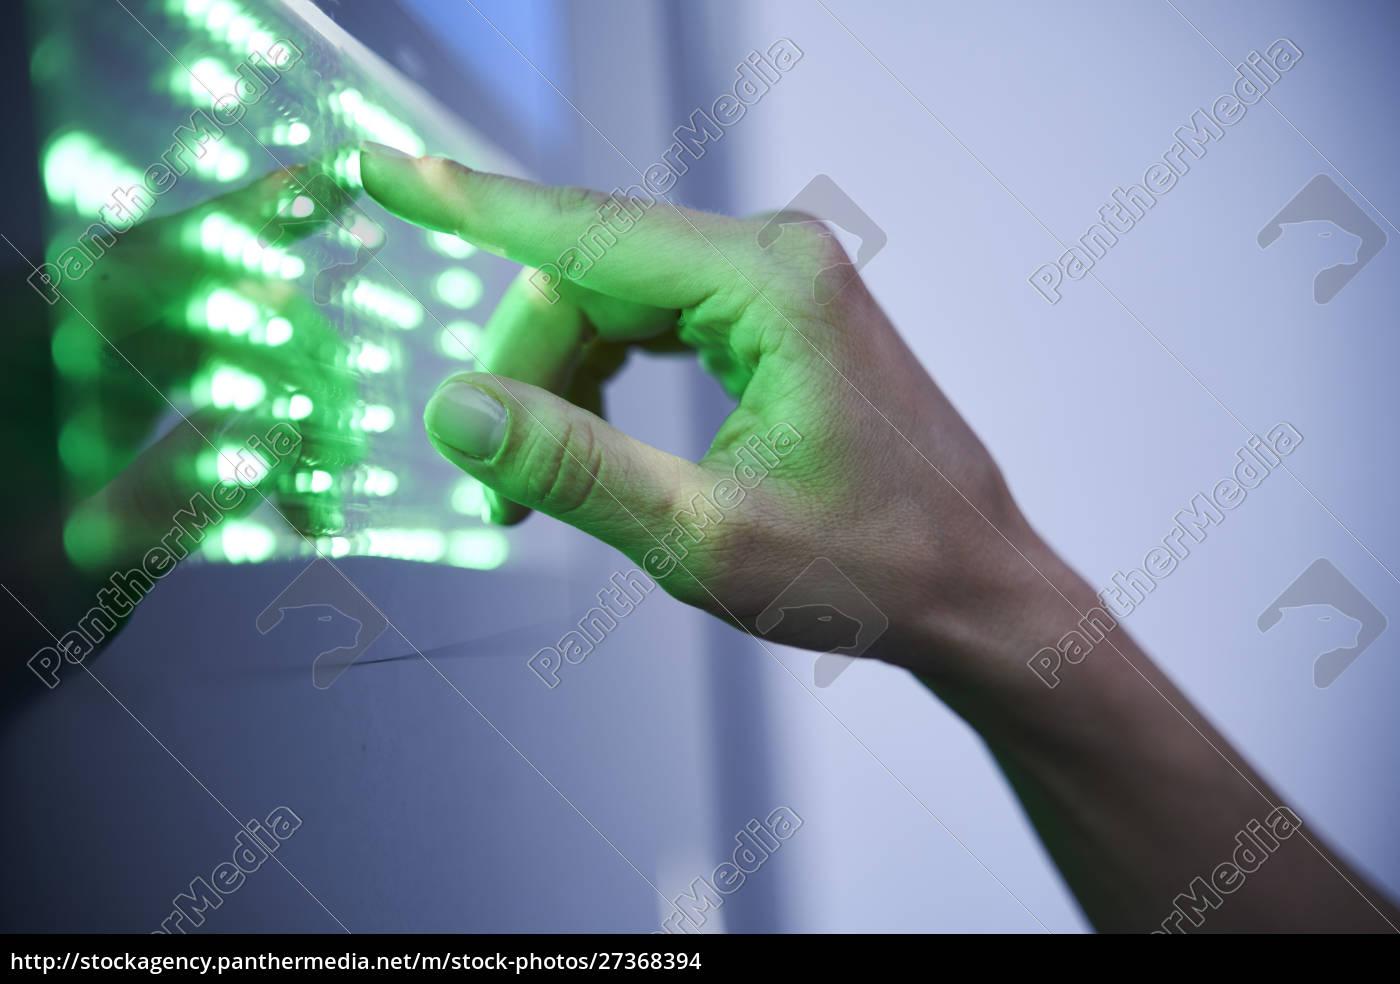 detail, of, finger, touching, green, led - 27368394